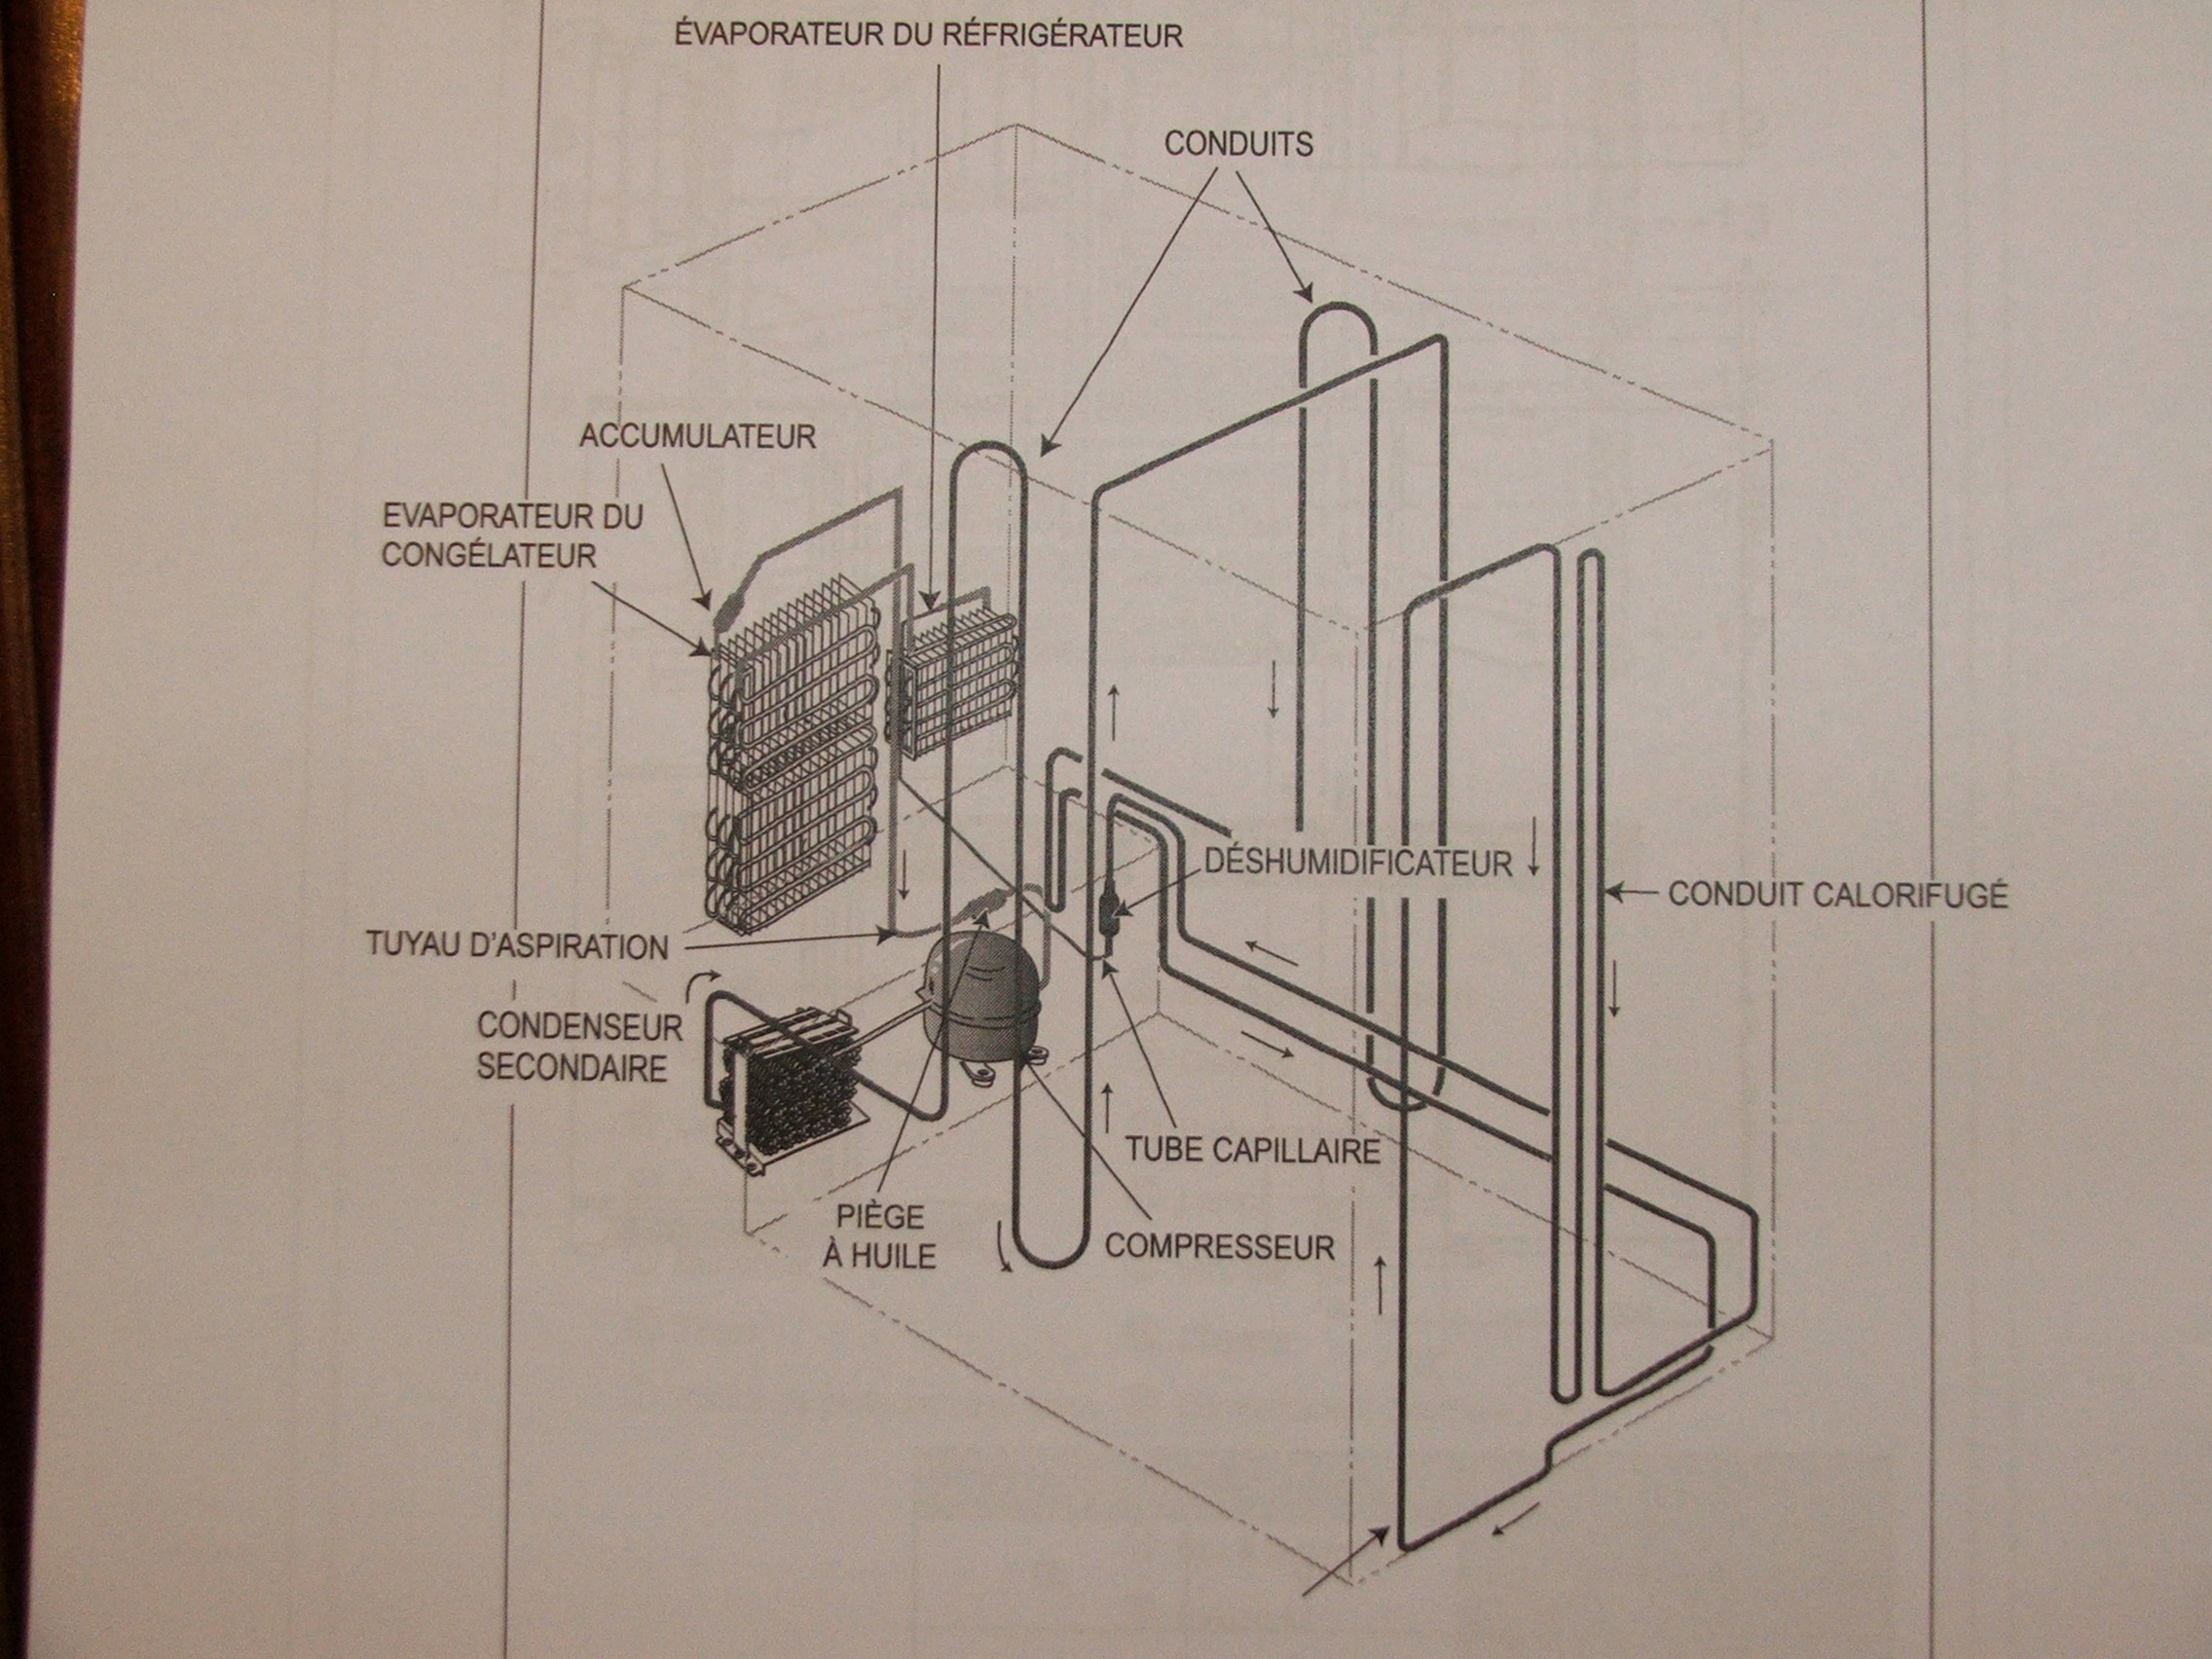 lod�wka Samsung RSH1 KBRS niestabilna temeratura